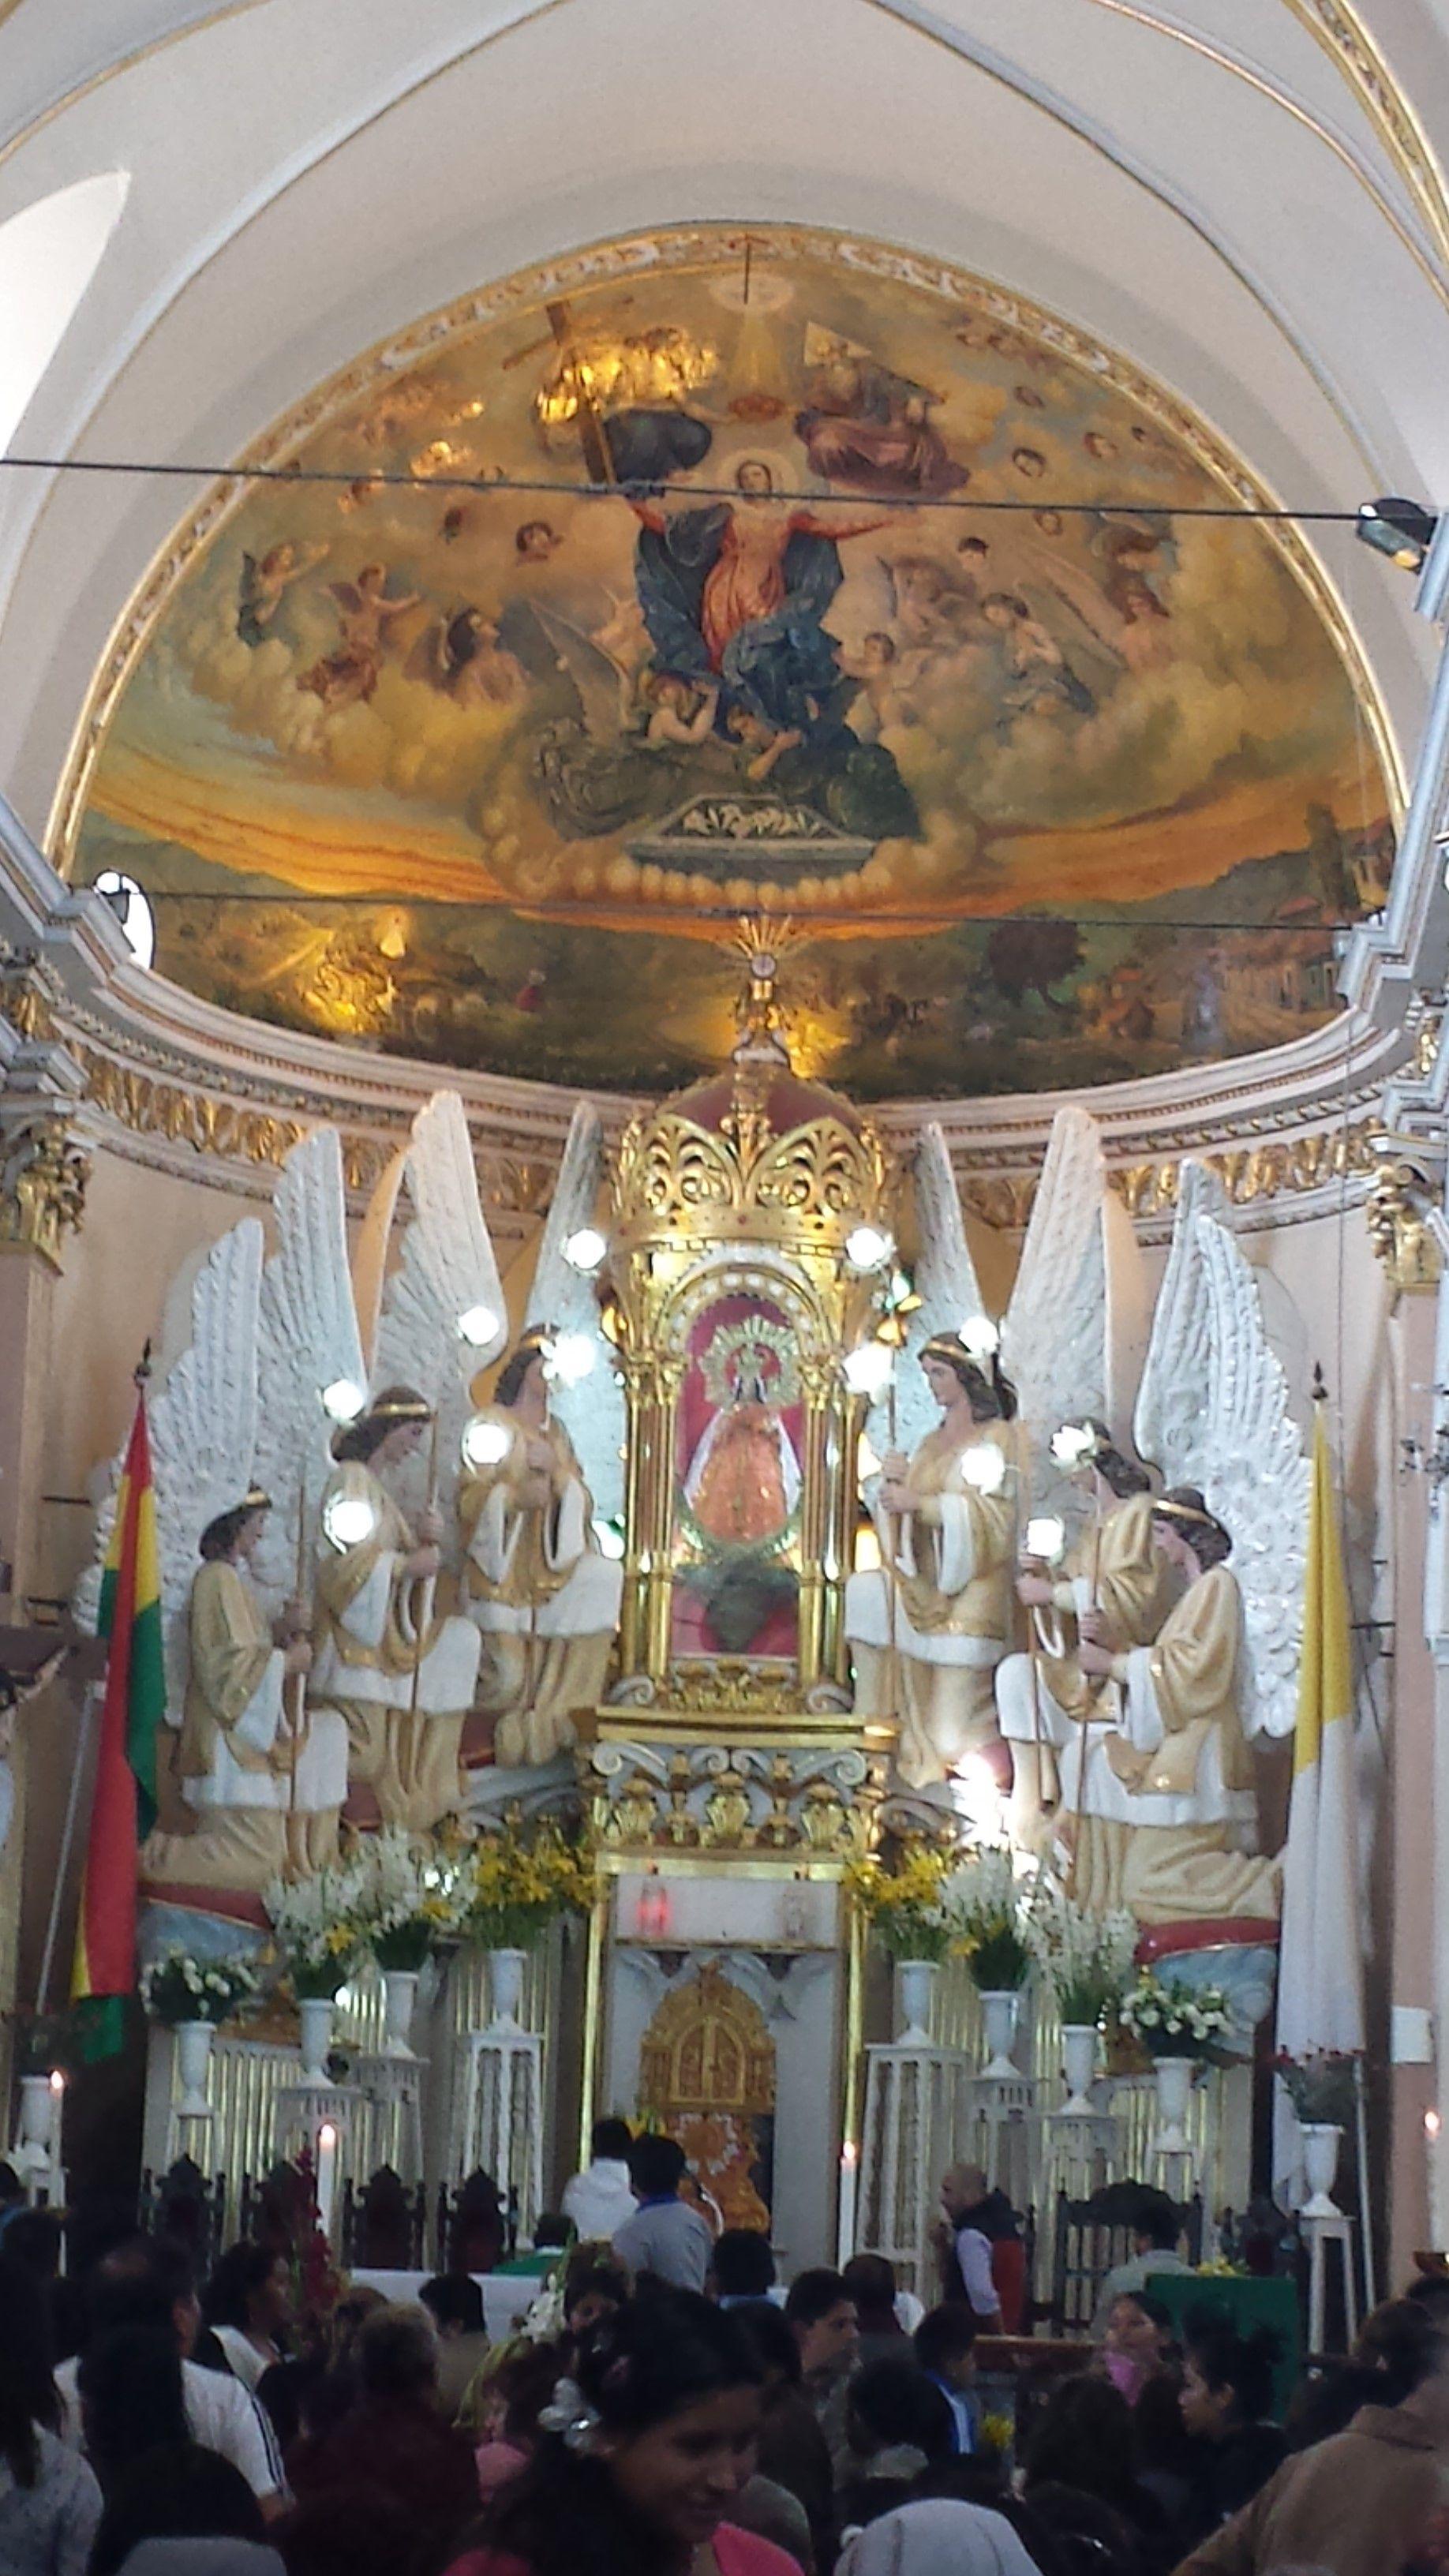 Iglesia En Quillacollo Virgen De Urkupina Virgen De Urkupina Bolivia Iglesia